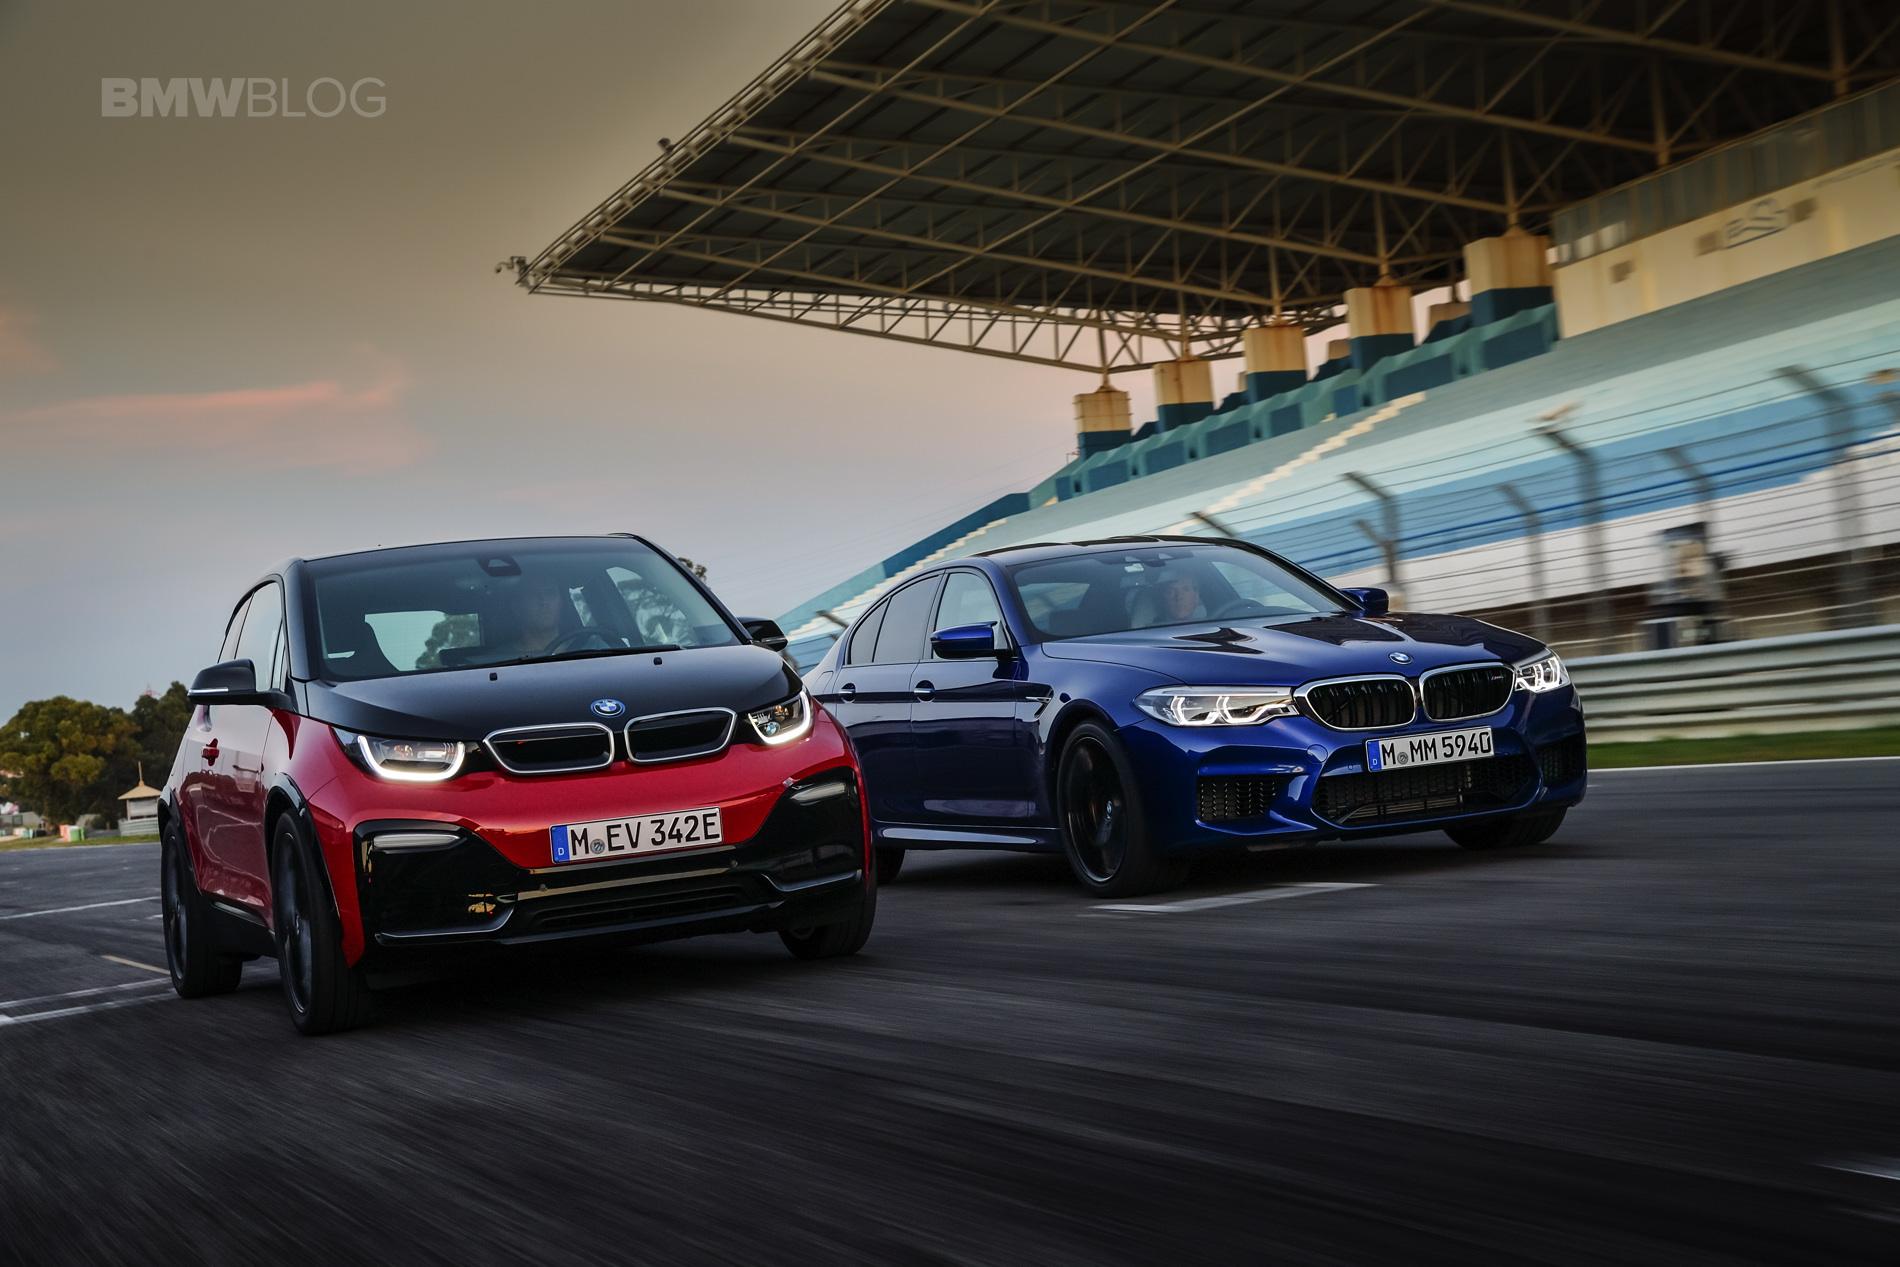 BMW M5 i3s race track 19